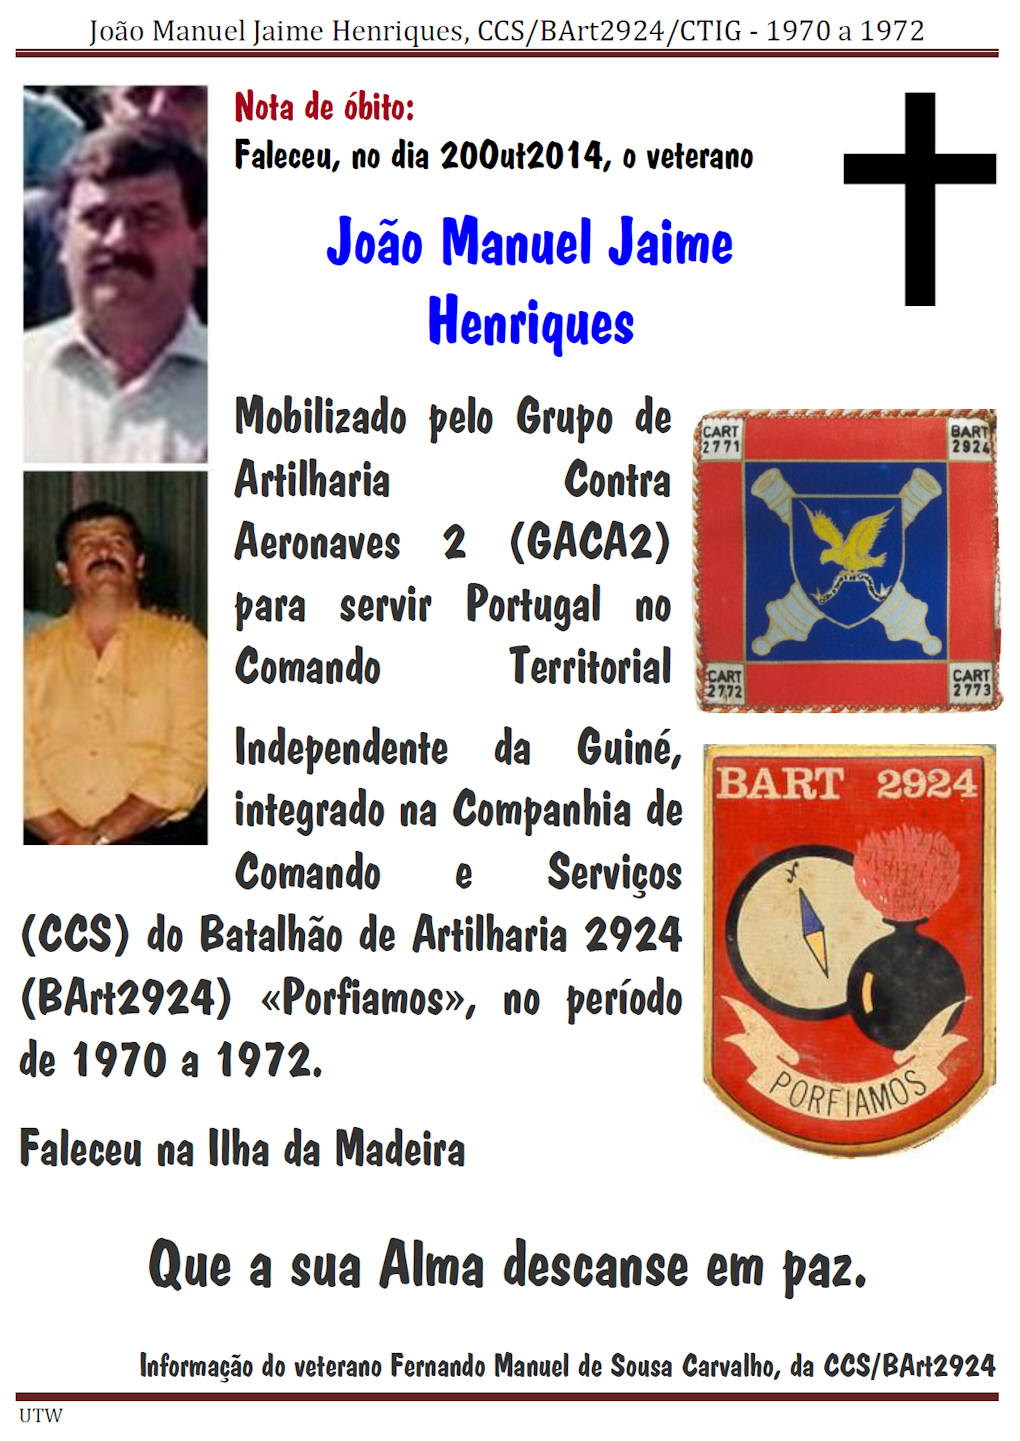 Faleceu o veterano João Manuel Jaime Henriques, da CCS/BArt2924/CTIG - 20Out2014 Joaoma11